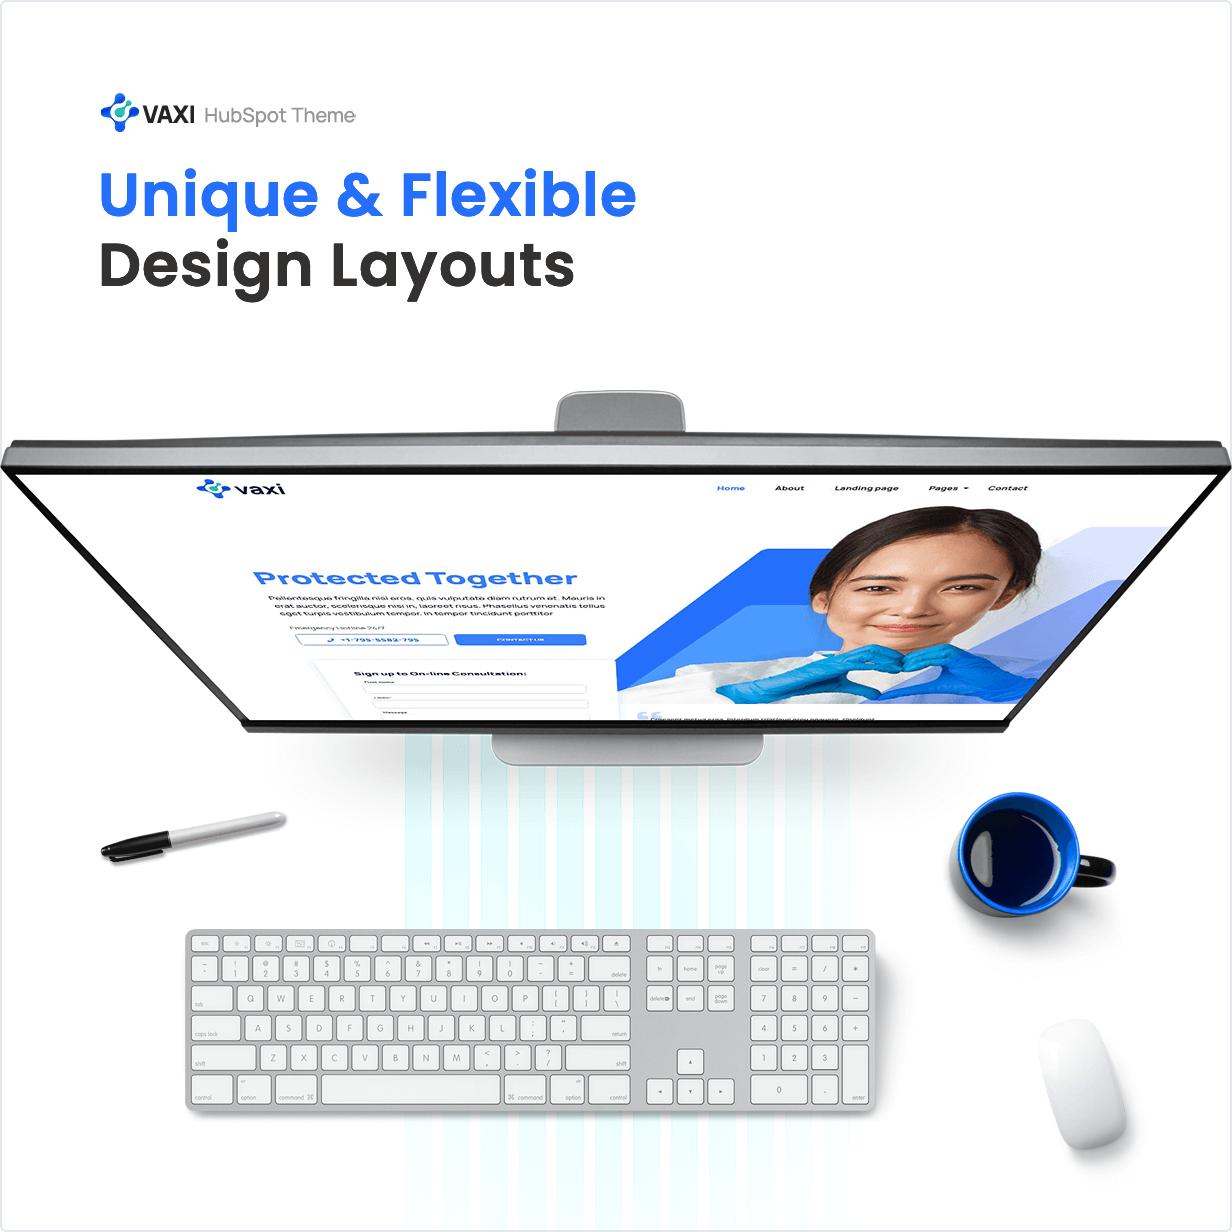 Unique and Flexible Design Layouts